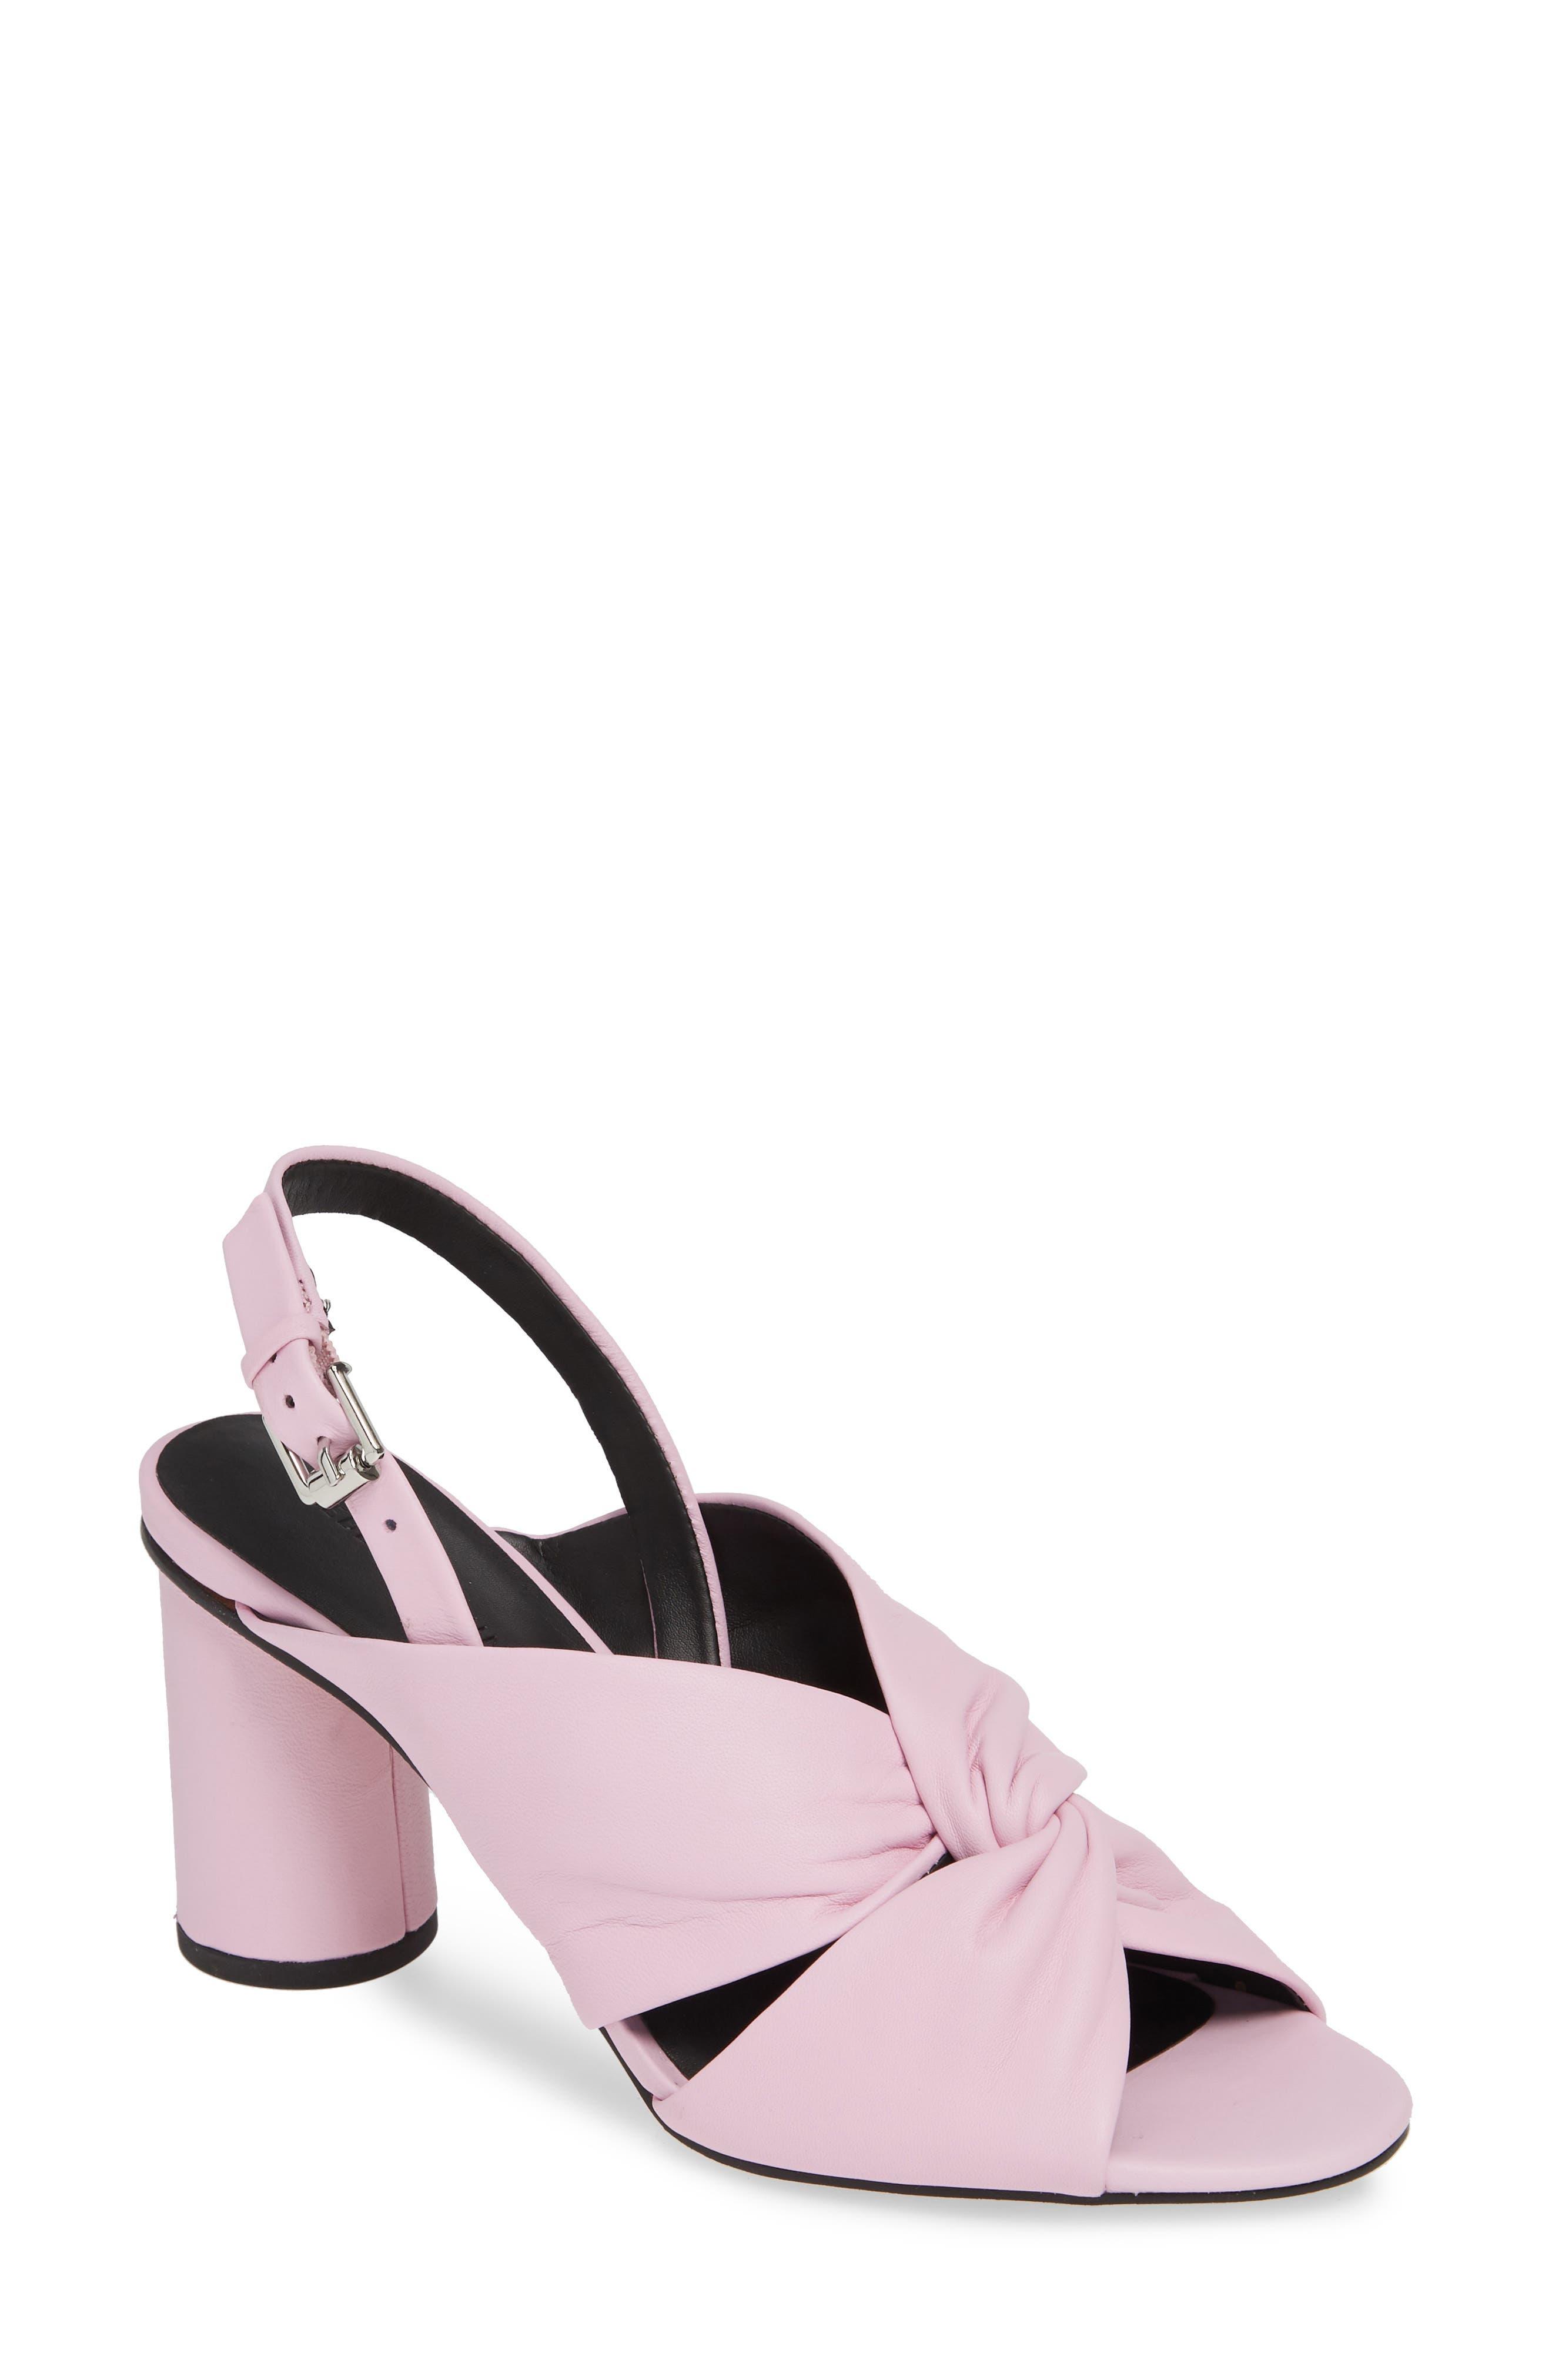 Rebecca Minkoff Agata Slingback Sandal, Purple